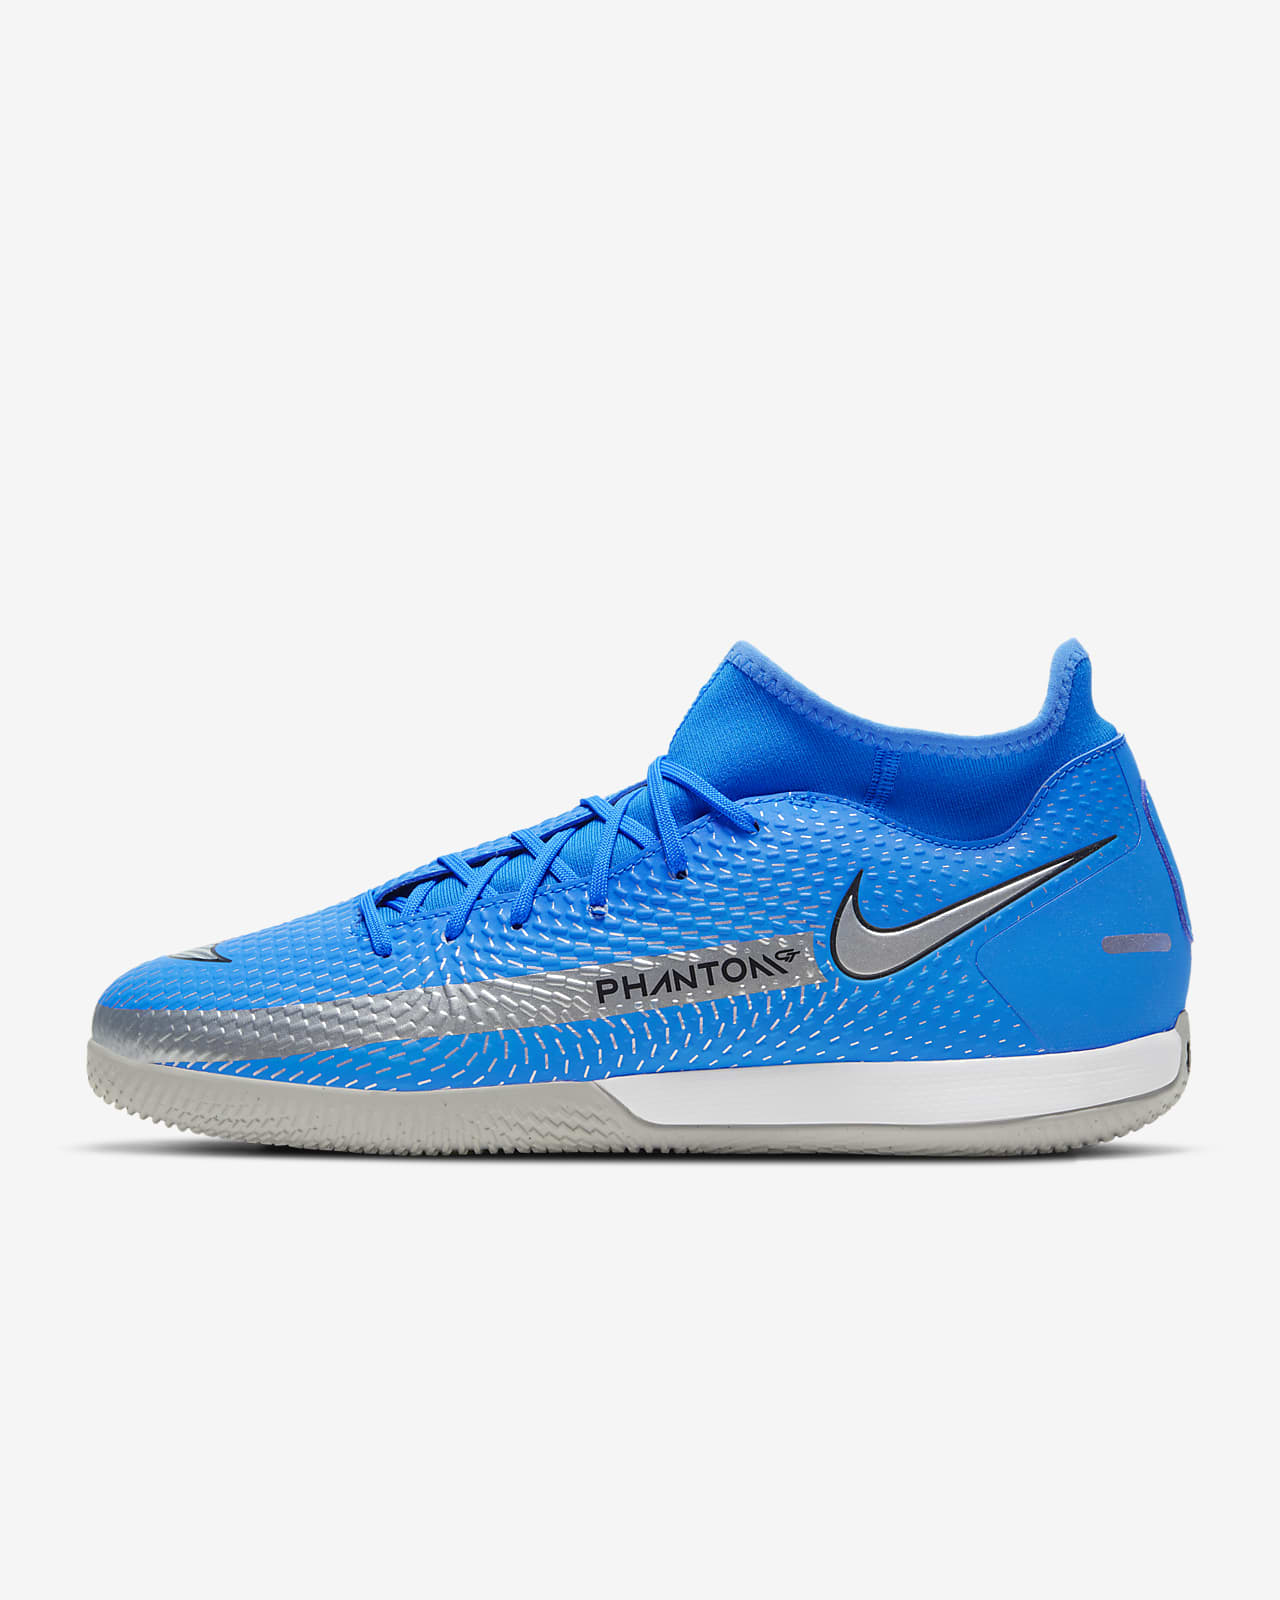 Nike Phantom GT Academy Dynamic Fit IC 體育館/路面足球鞋